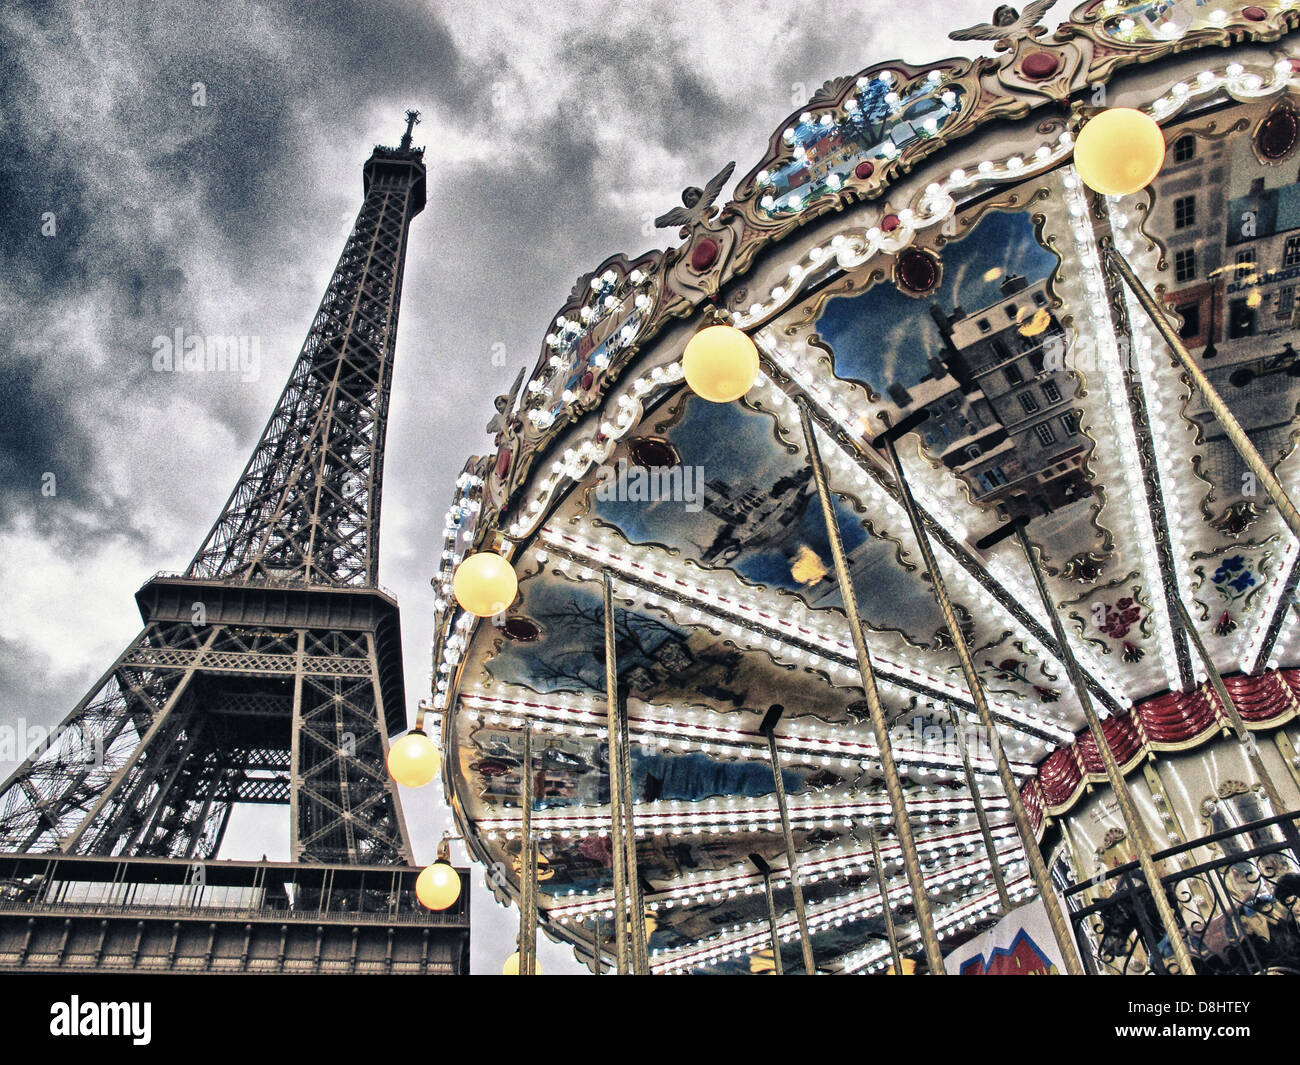 At,Night,Dusk,early,evening,France,la,cite,city,Europe,europa,EEC,EU,country,fun,euro,disney,eurodisney,travel,tourism,tourist,image,fun,holiday,vacances,vacation,interesting,sky,french,politics,political,Champ,greenspace,seventh,arrondissement,7th,Gustave,tourist,tour,tourism,Iconic Paris,gotonysmith,Métro,stations,La,Motte-Picquet–Grenelle,École,Militaire.,Champ,de,Mars-Tour,Eiffel,RER,MetroMotte,Picquet,Grenelle,and,Ecole,RAPT,metro,tourist,tour,tourism,travel,icon,Buy Pictures of,Buy Images Of,Iconic Paris